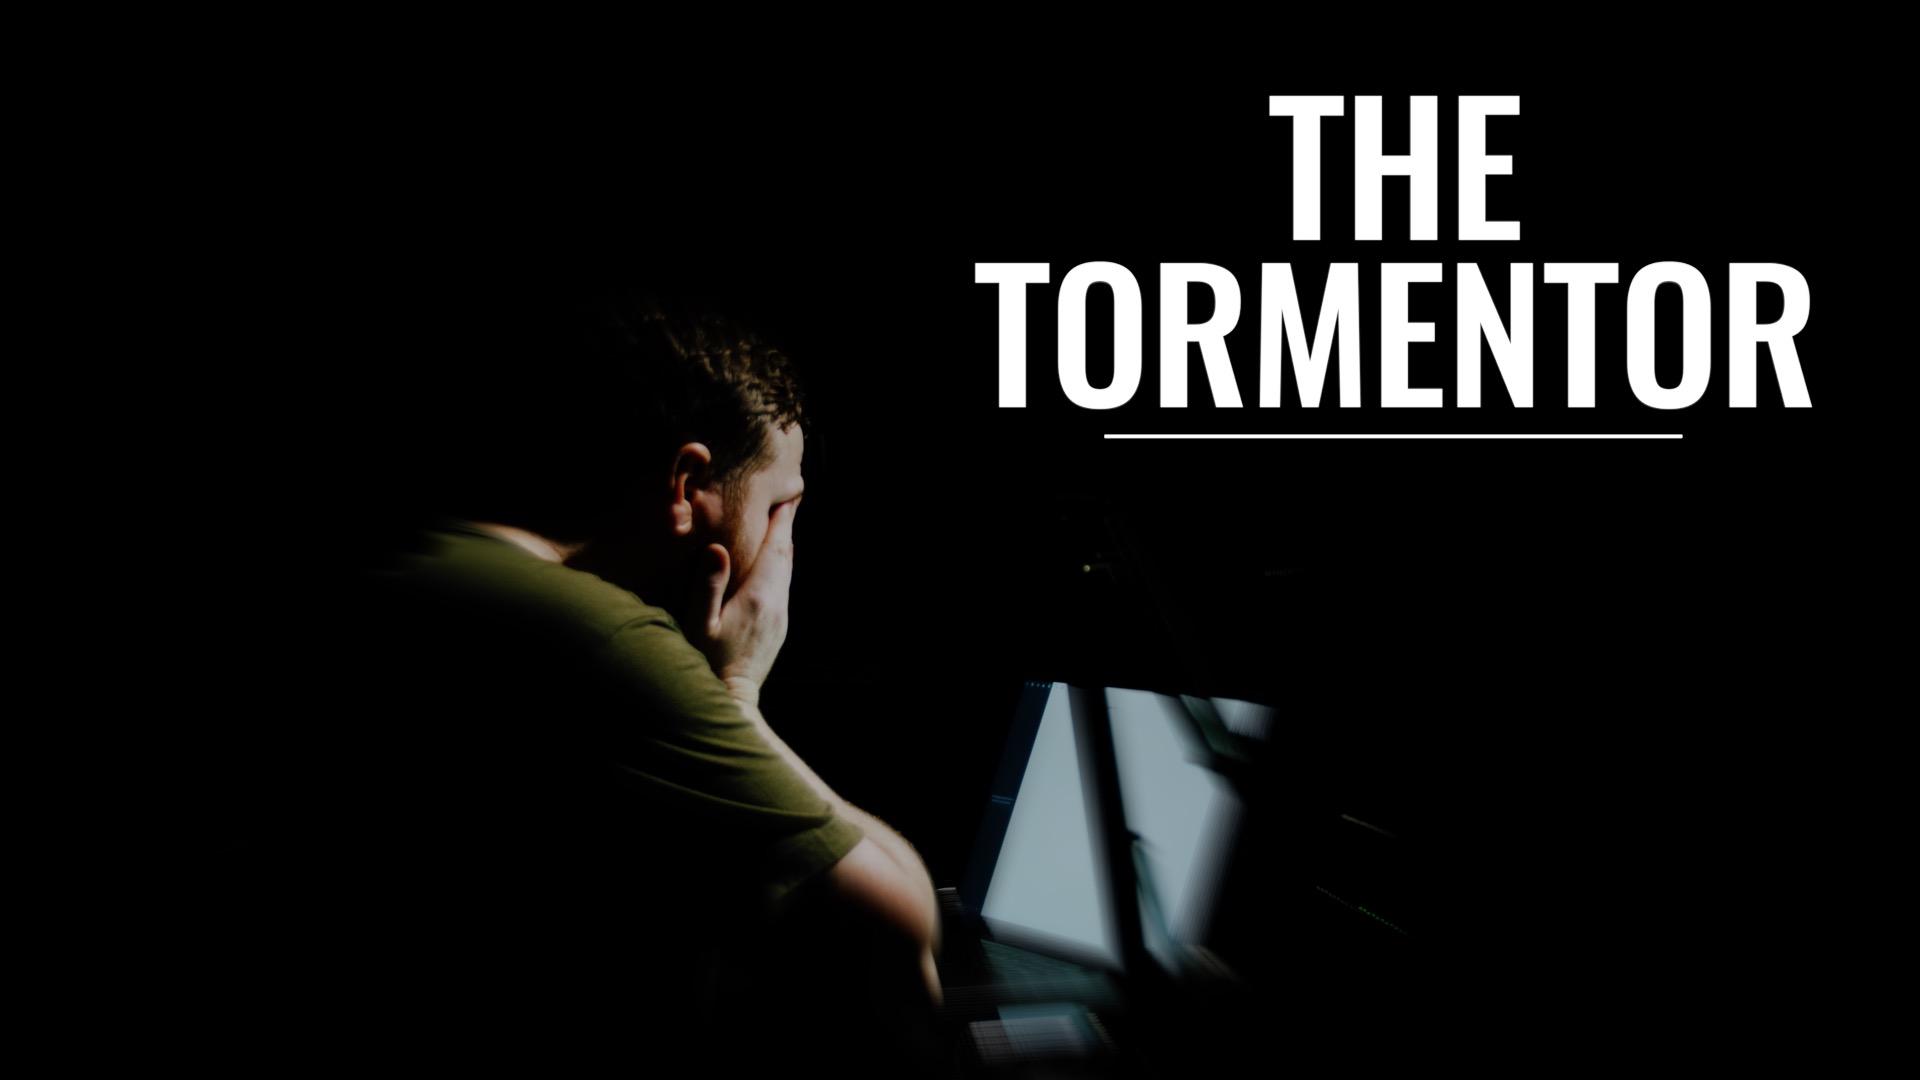 THE TORMENTOR || My RØDE Reel 2020